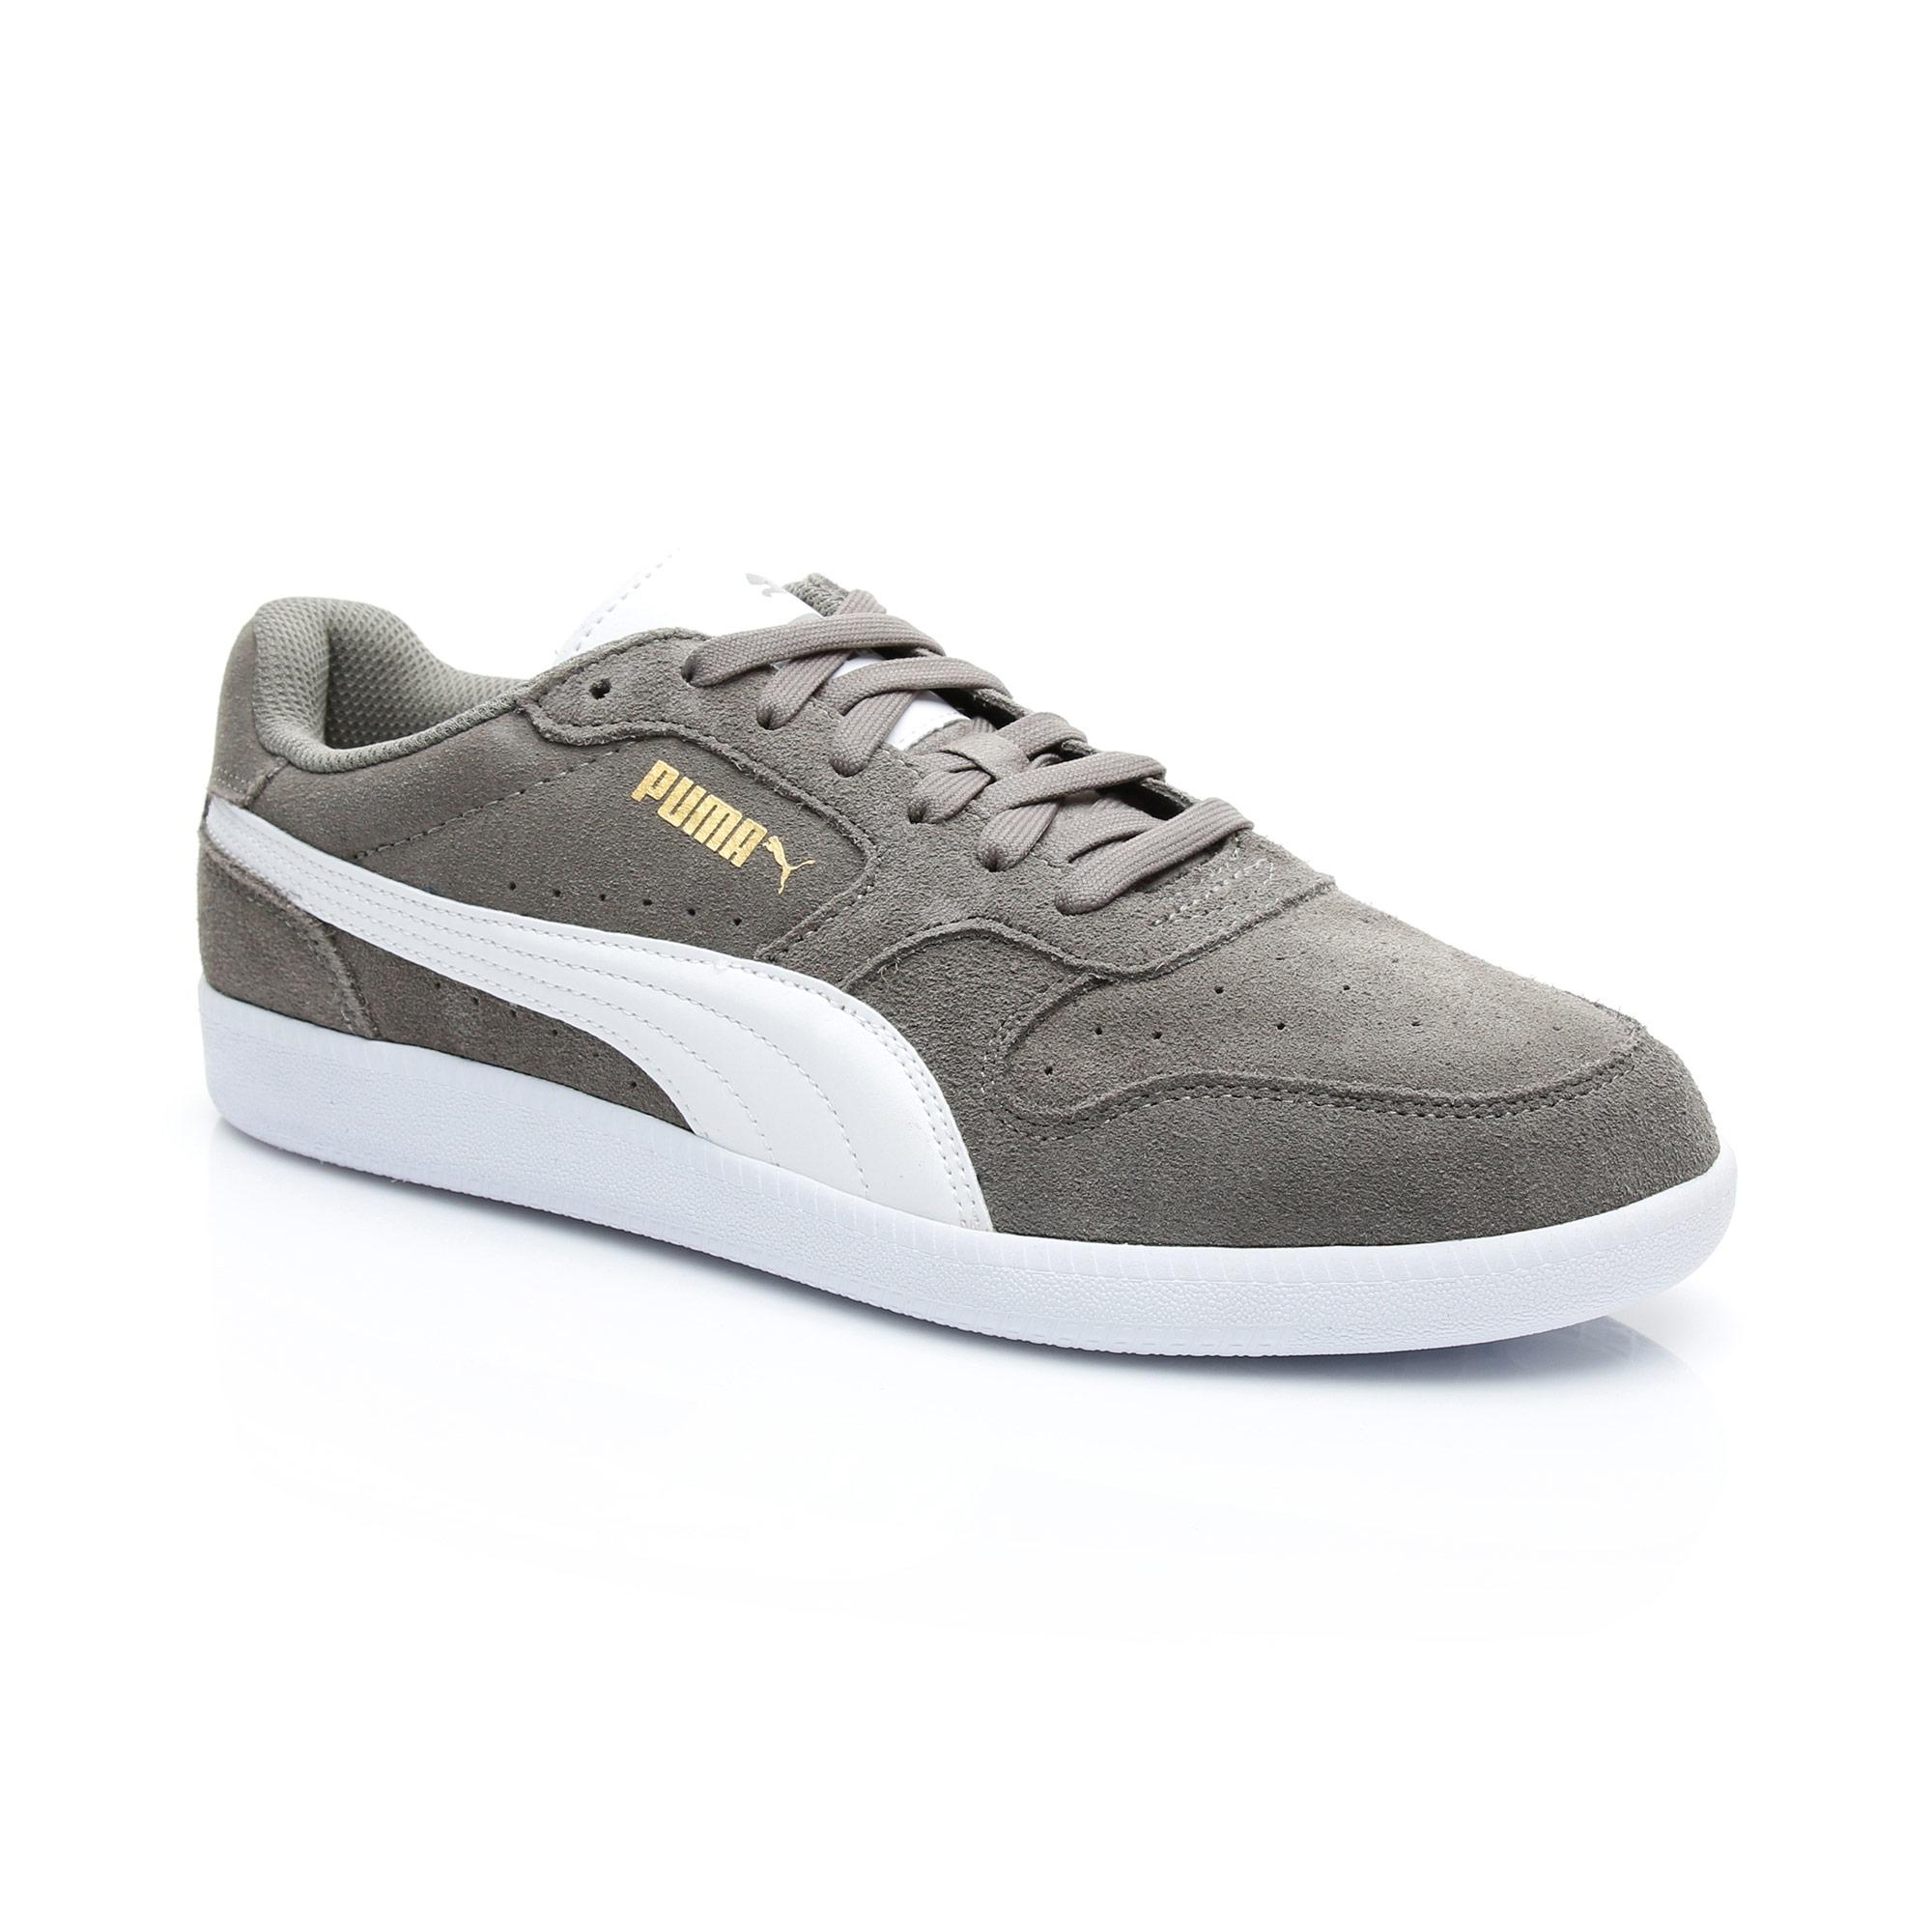 Puma Icra Trainer Sd Erkek Gri Sneaker